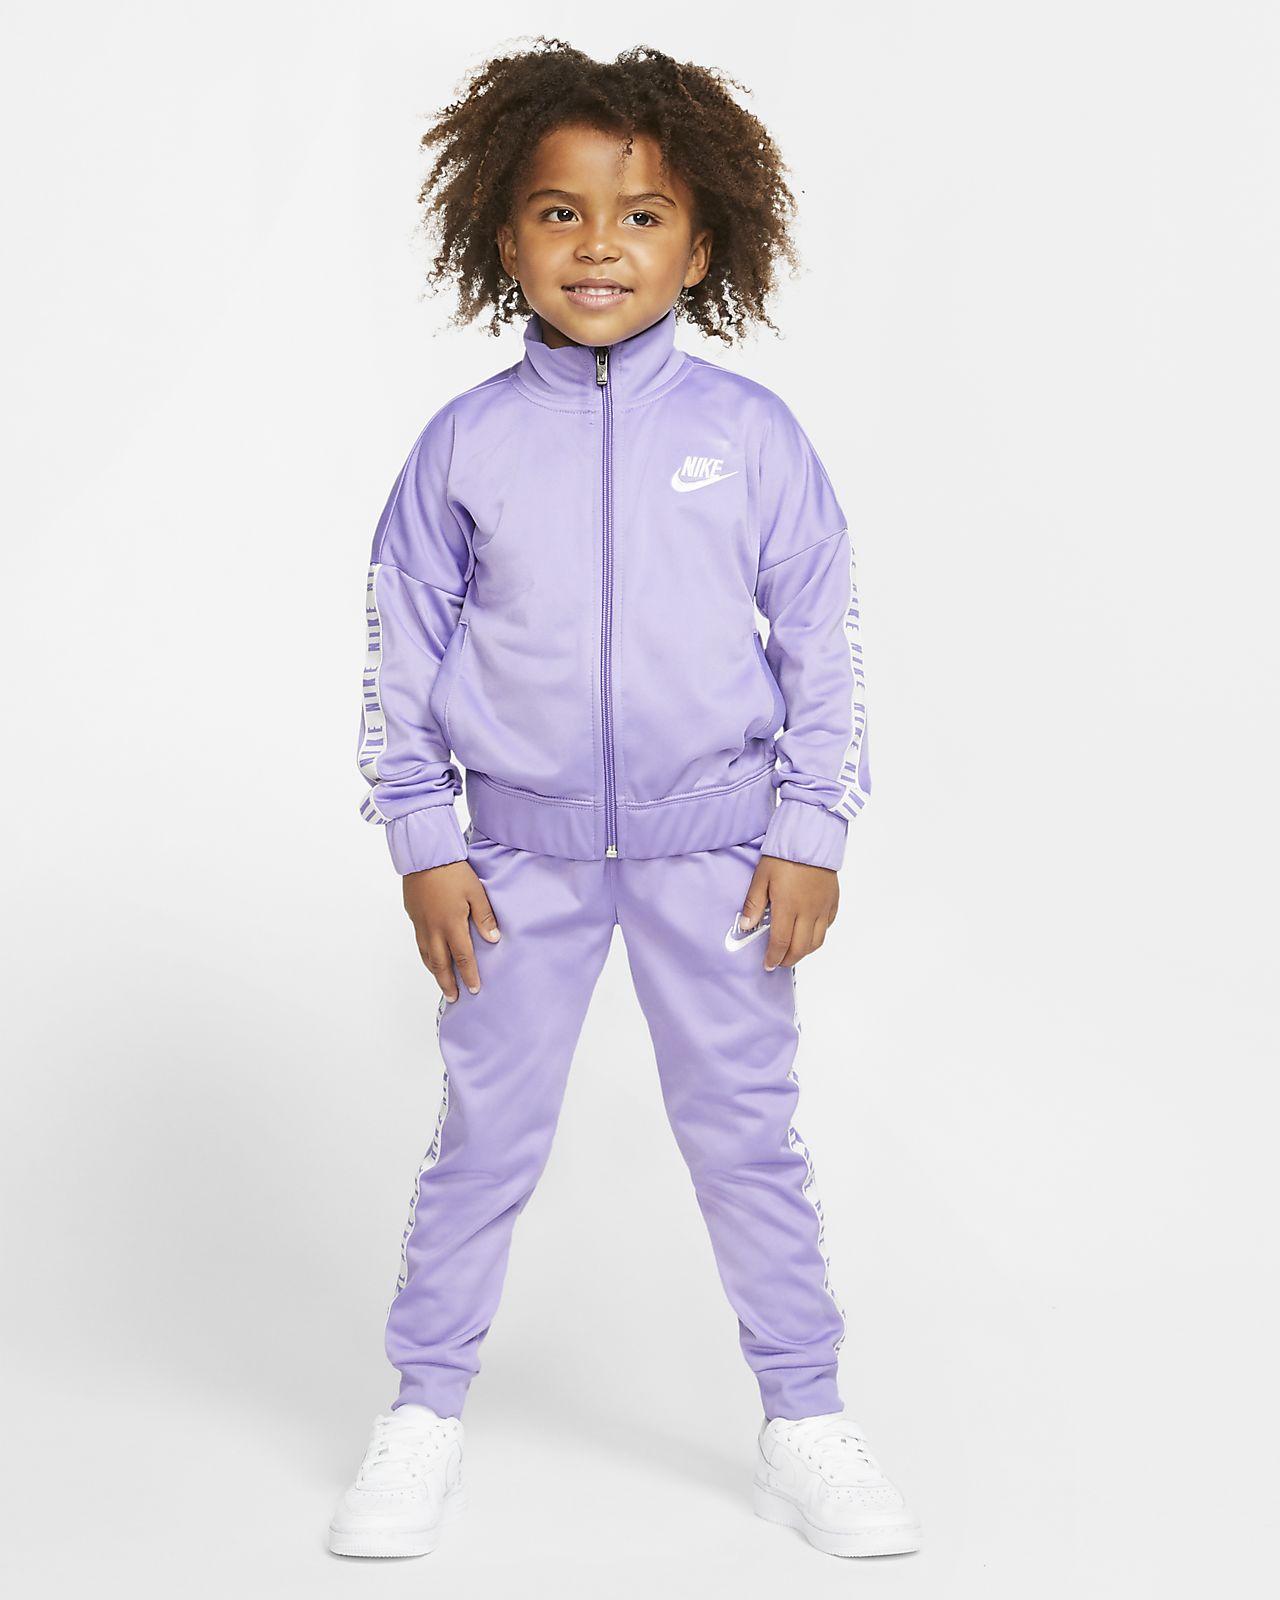 Nike Sportswear Trainingsanzug für jüngere Kinder